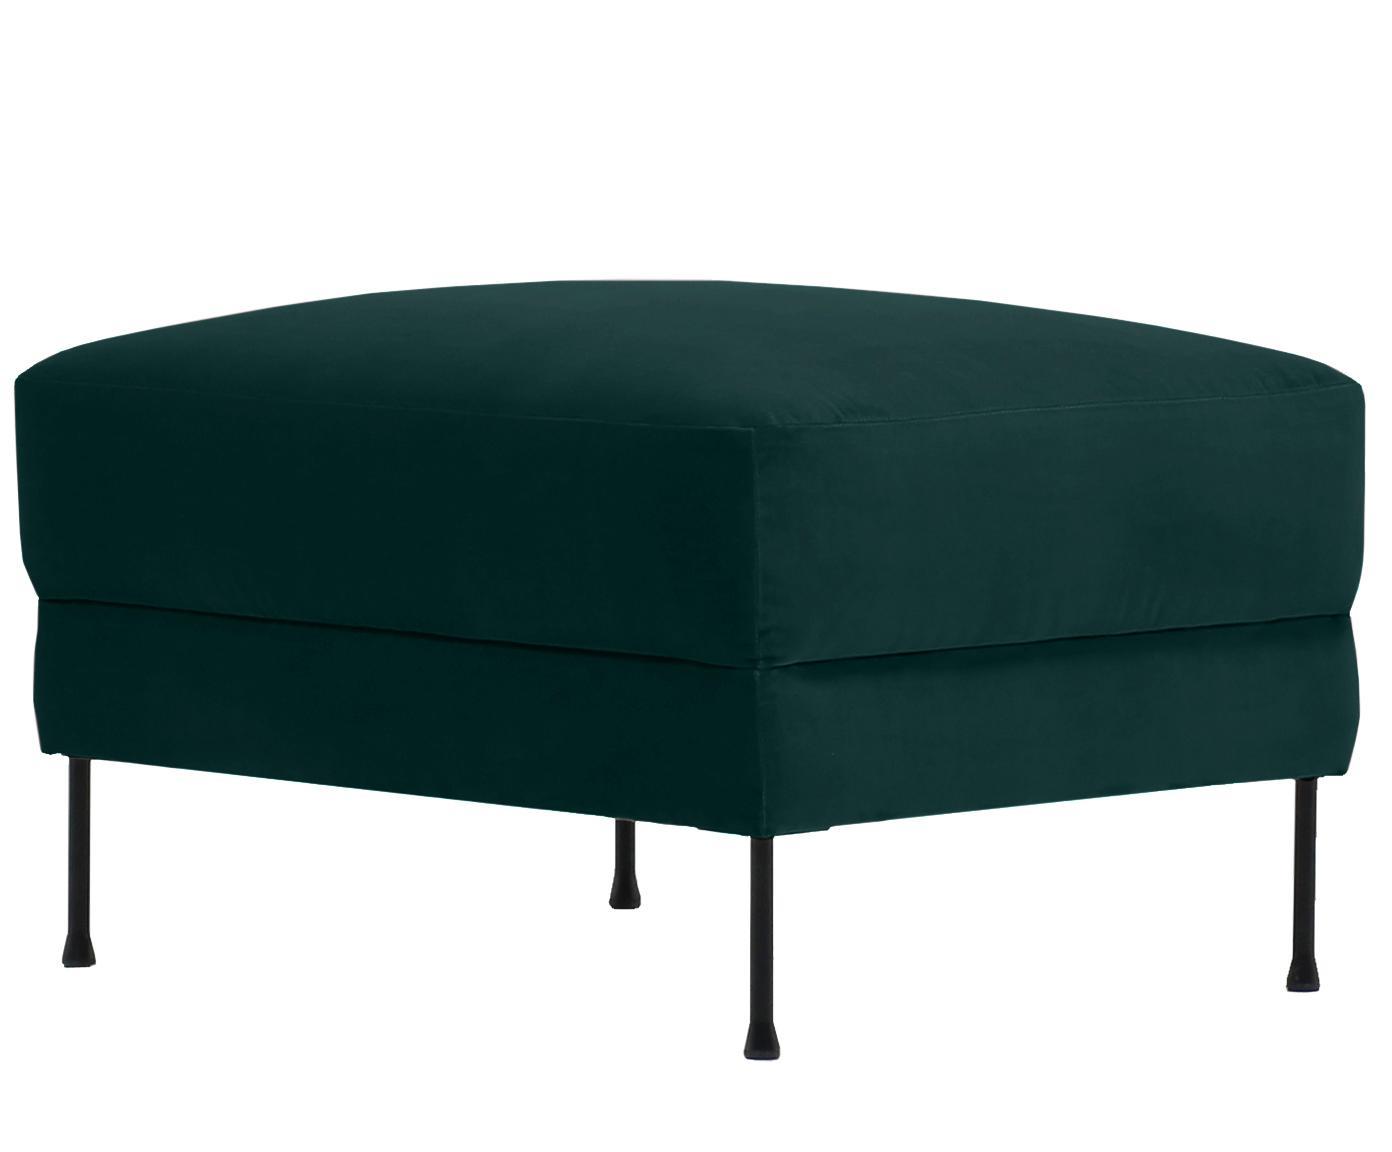 Sofa-Hocker Fluente aus Samt, Bezug: Samt (Hochwertiger Polyes, Gestell: Sperrholz, Spanplatte, Samt Dunkelgrün, 62 x 46 cm